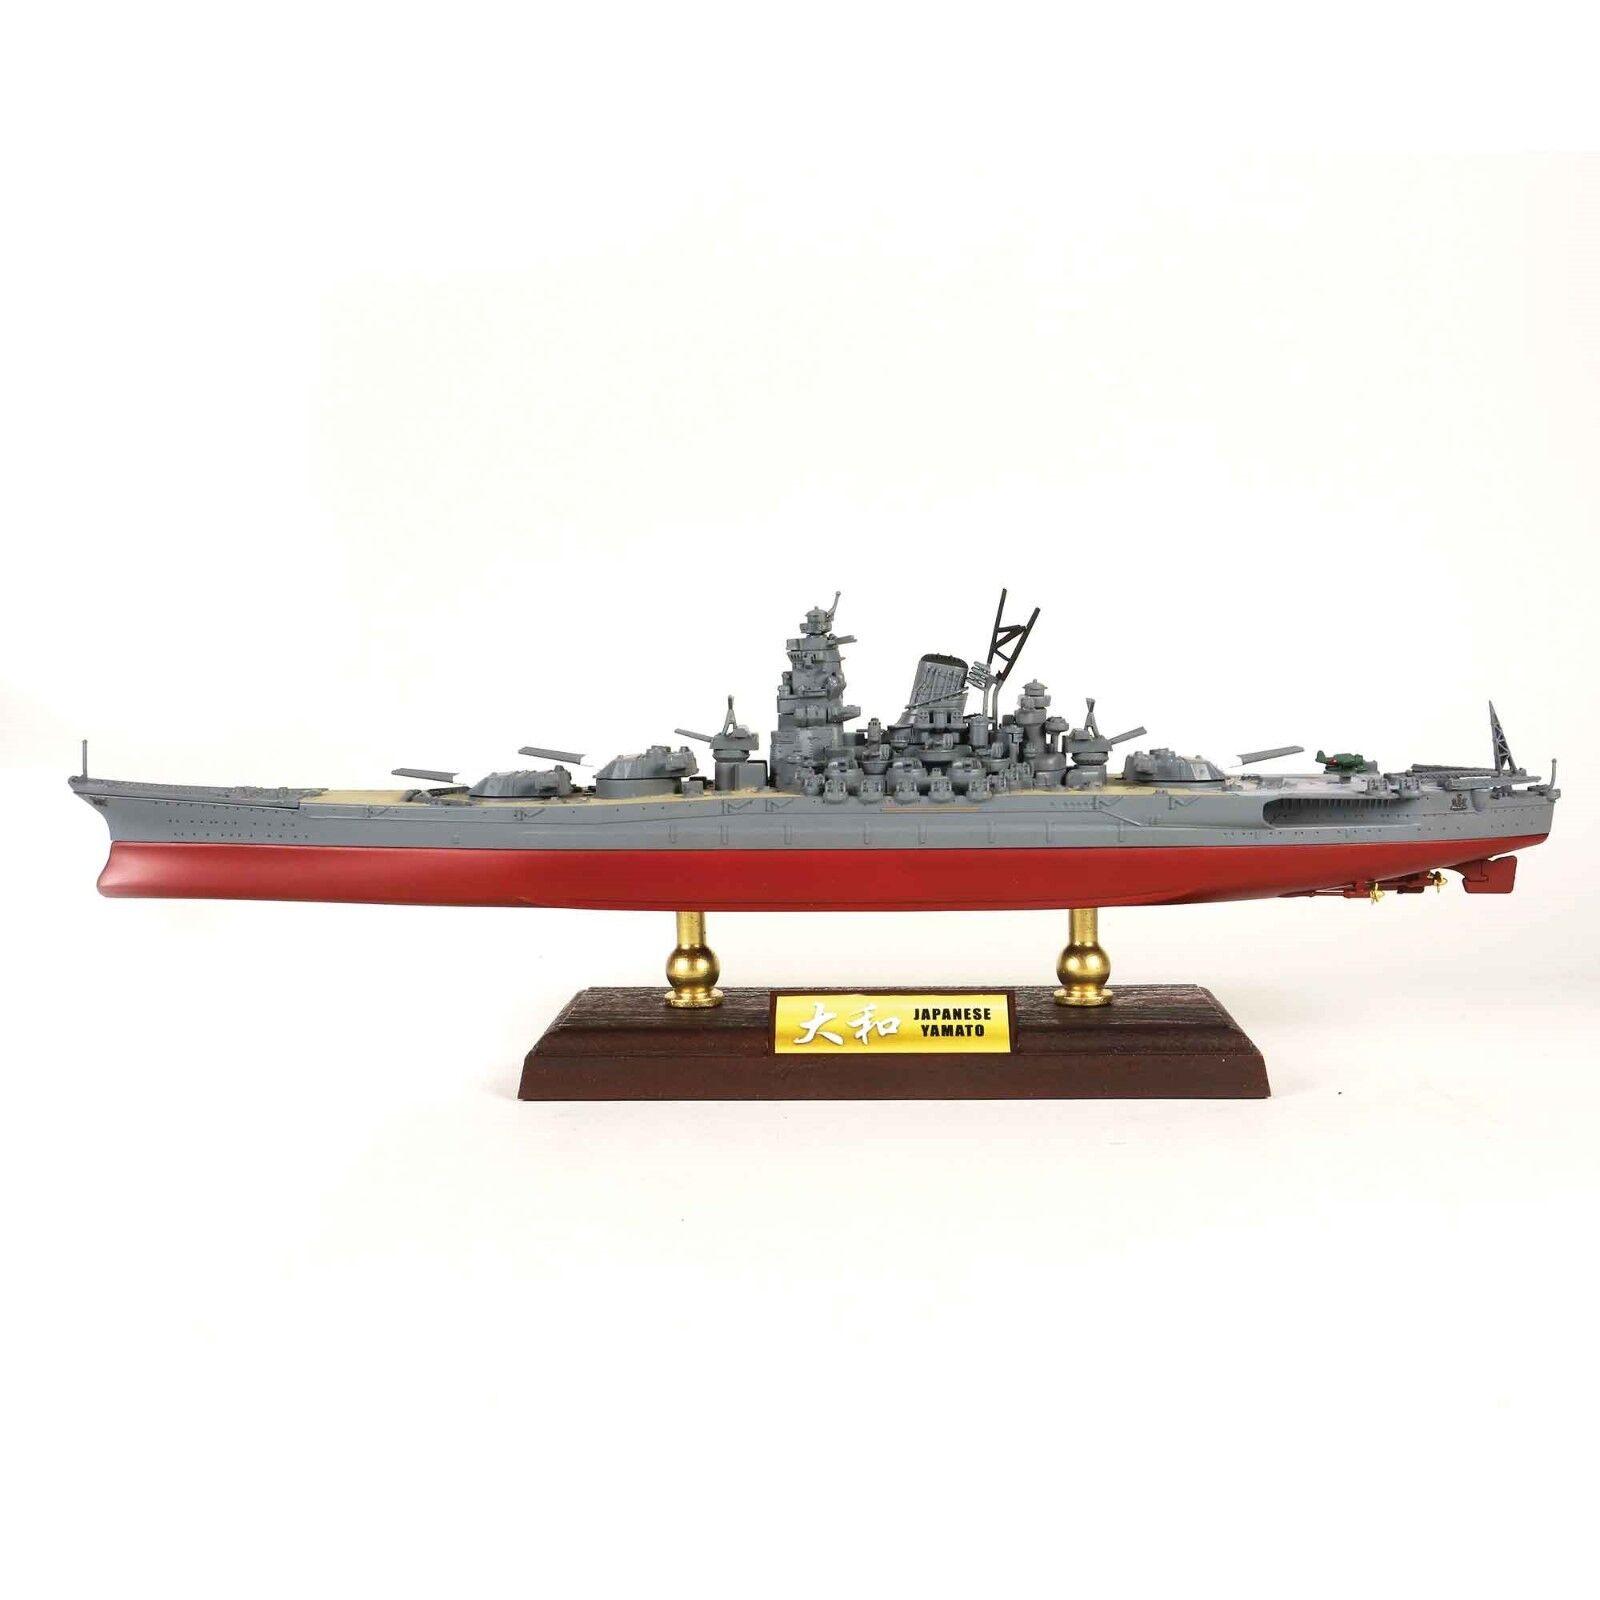 mejor moda Forces of valor valor valor 1 700 JAPANESE BATTLESHIP IJN Yamato FV-861004A de la segunda guerra mundial  buena calidad